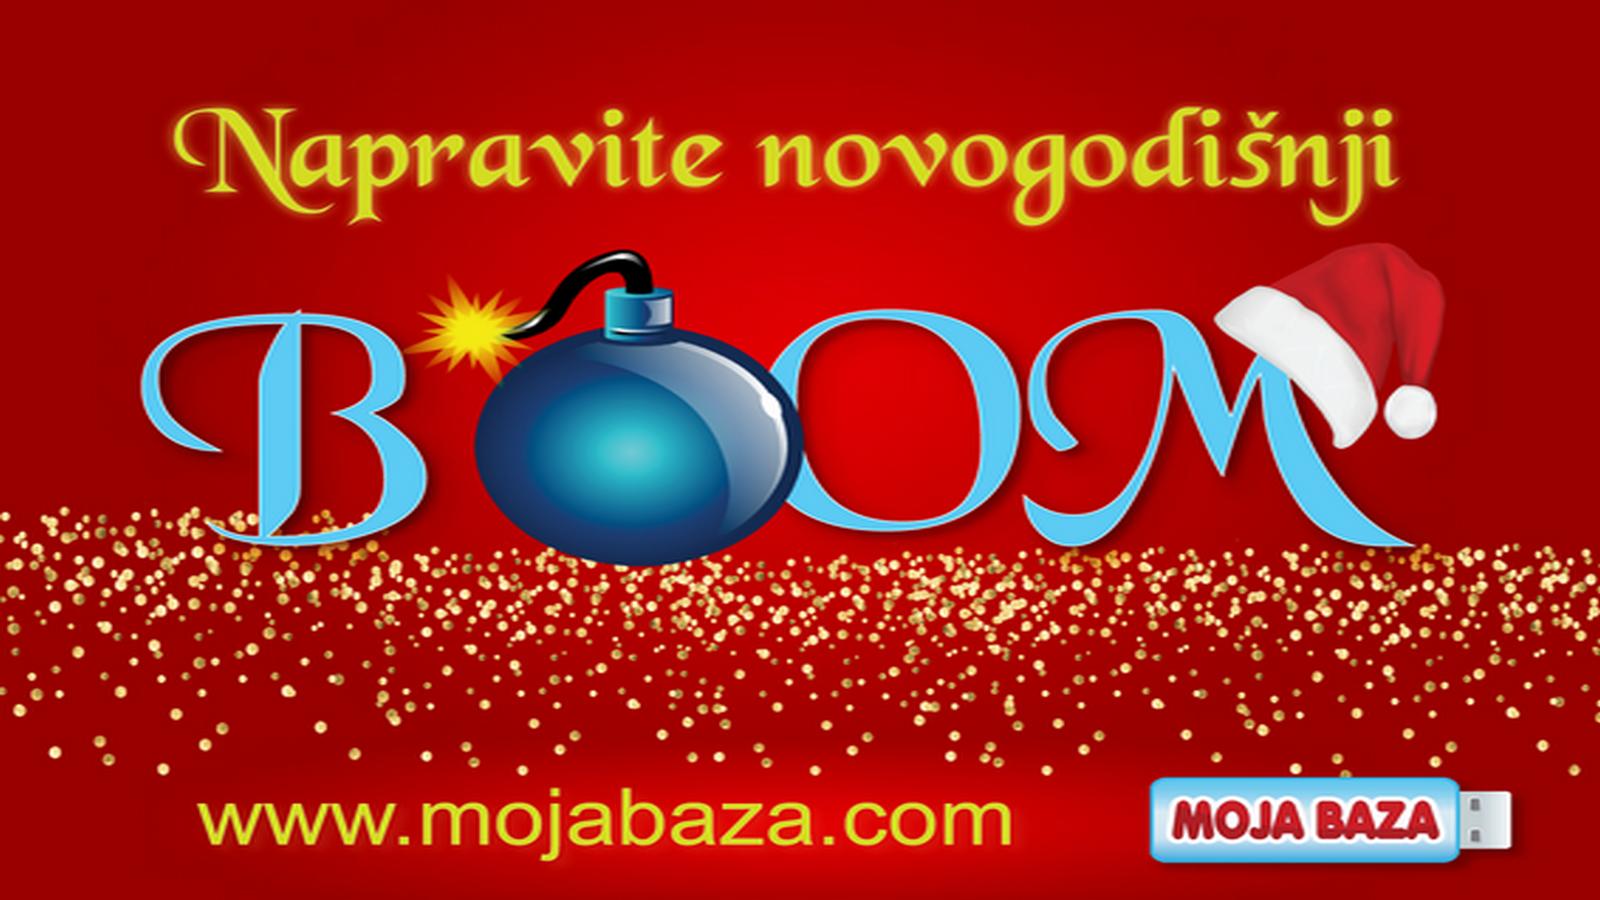 01moja-baza-veliki-baner-novogodisnji-popusti-specijalni-napravite-boom-oglasavanjem-uspeh-biznis-success-serbia-advertizing-reklame-2